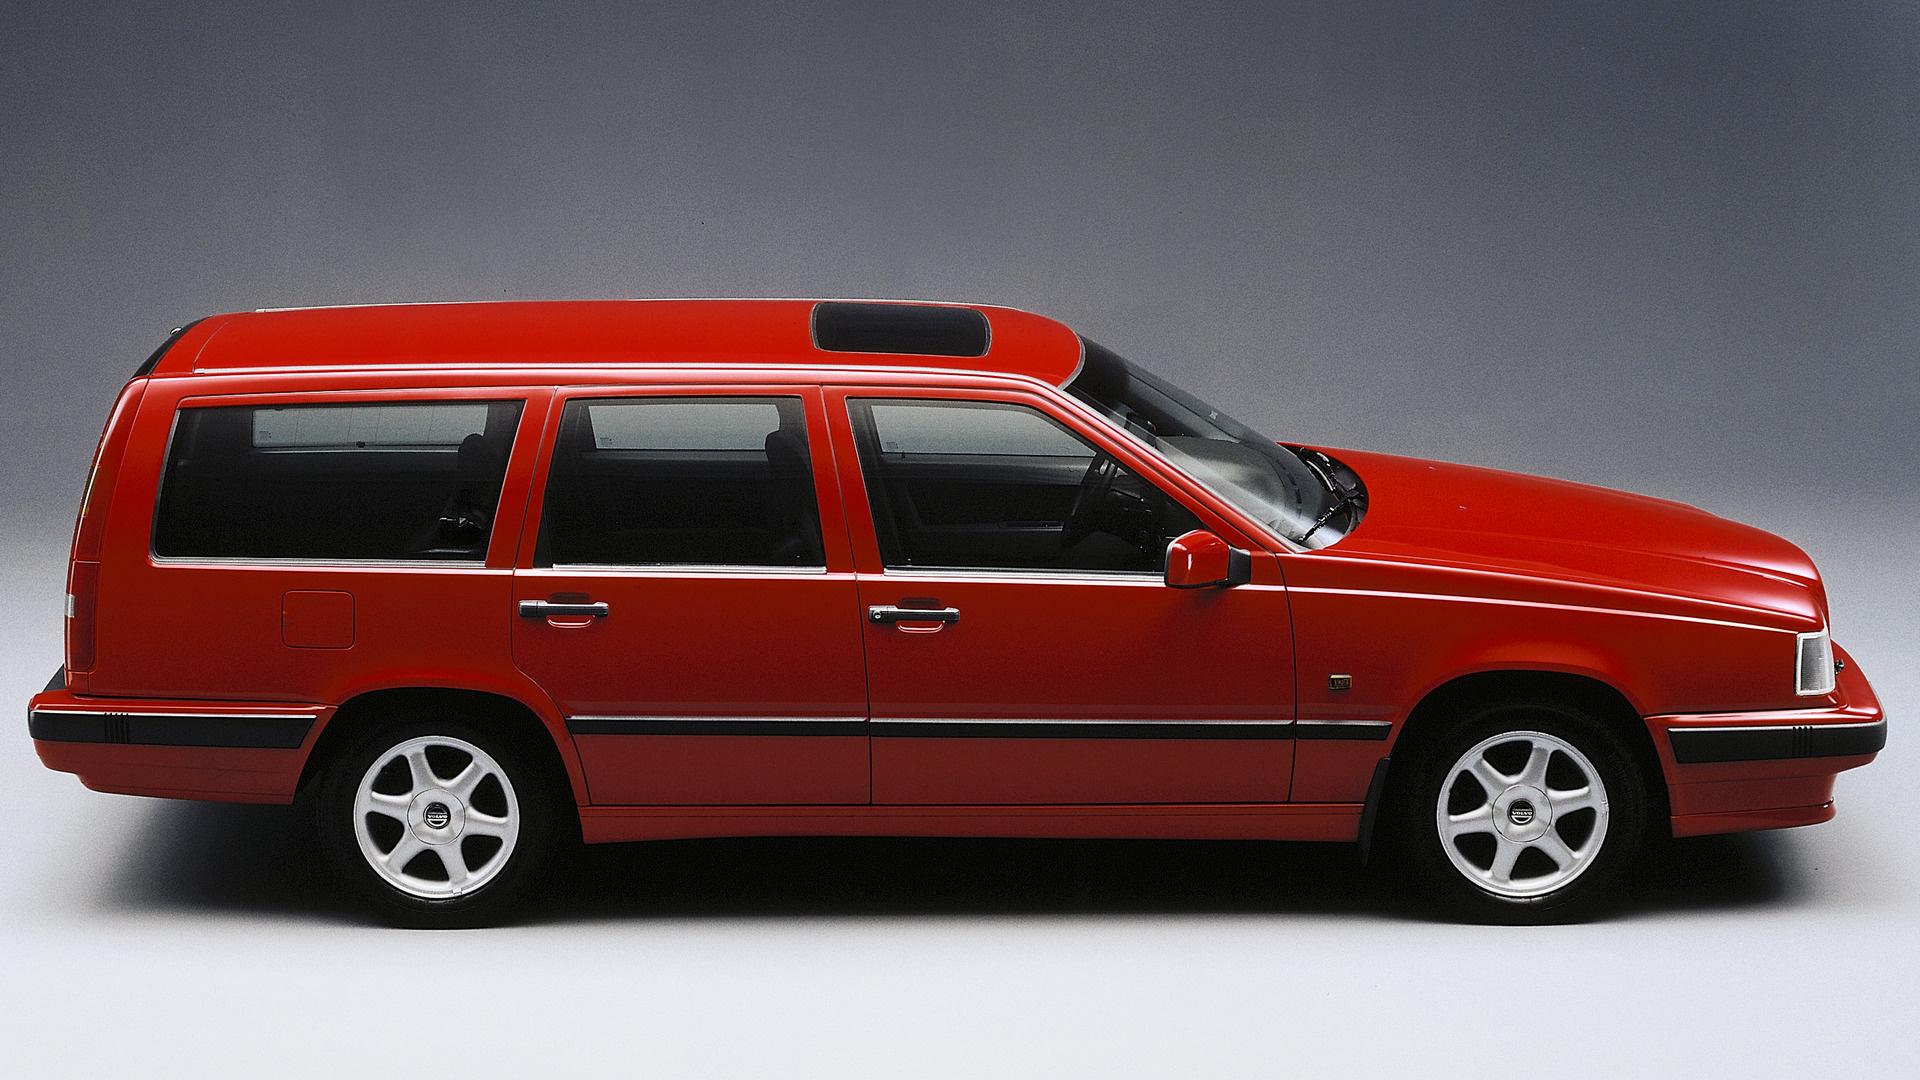 volvo 850 glt kombi 1992 wallpapers and hd images car pixel. Black Bedroom Furniture Sets. Home Design Ideas